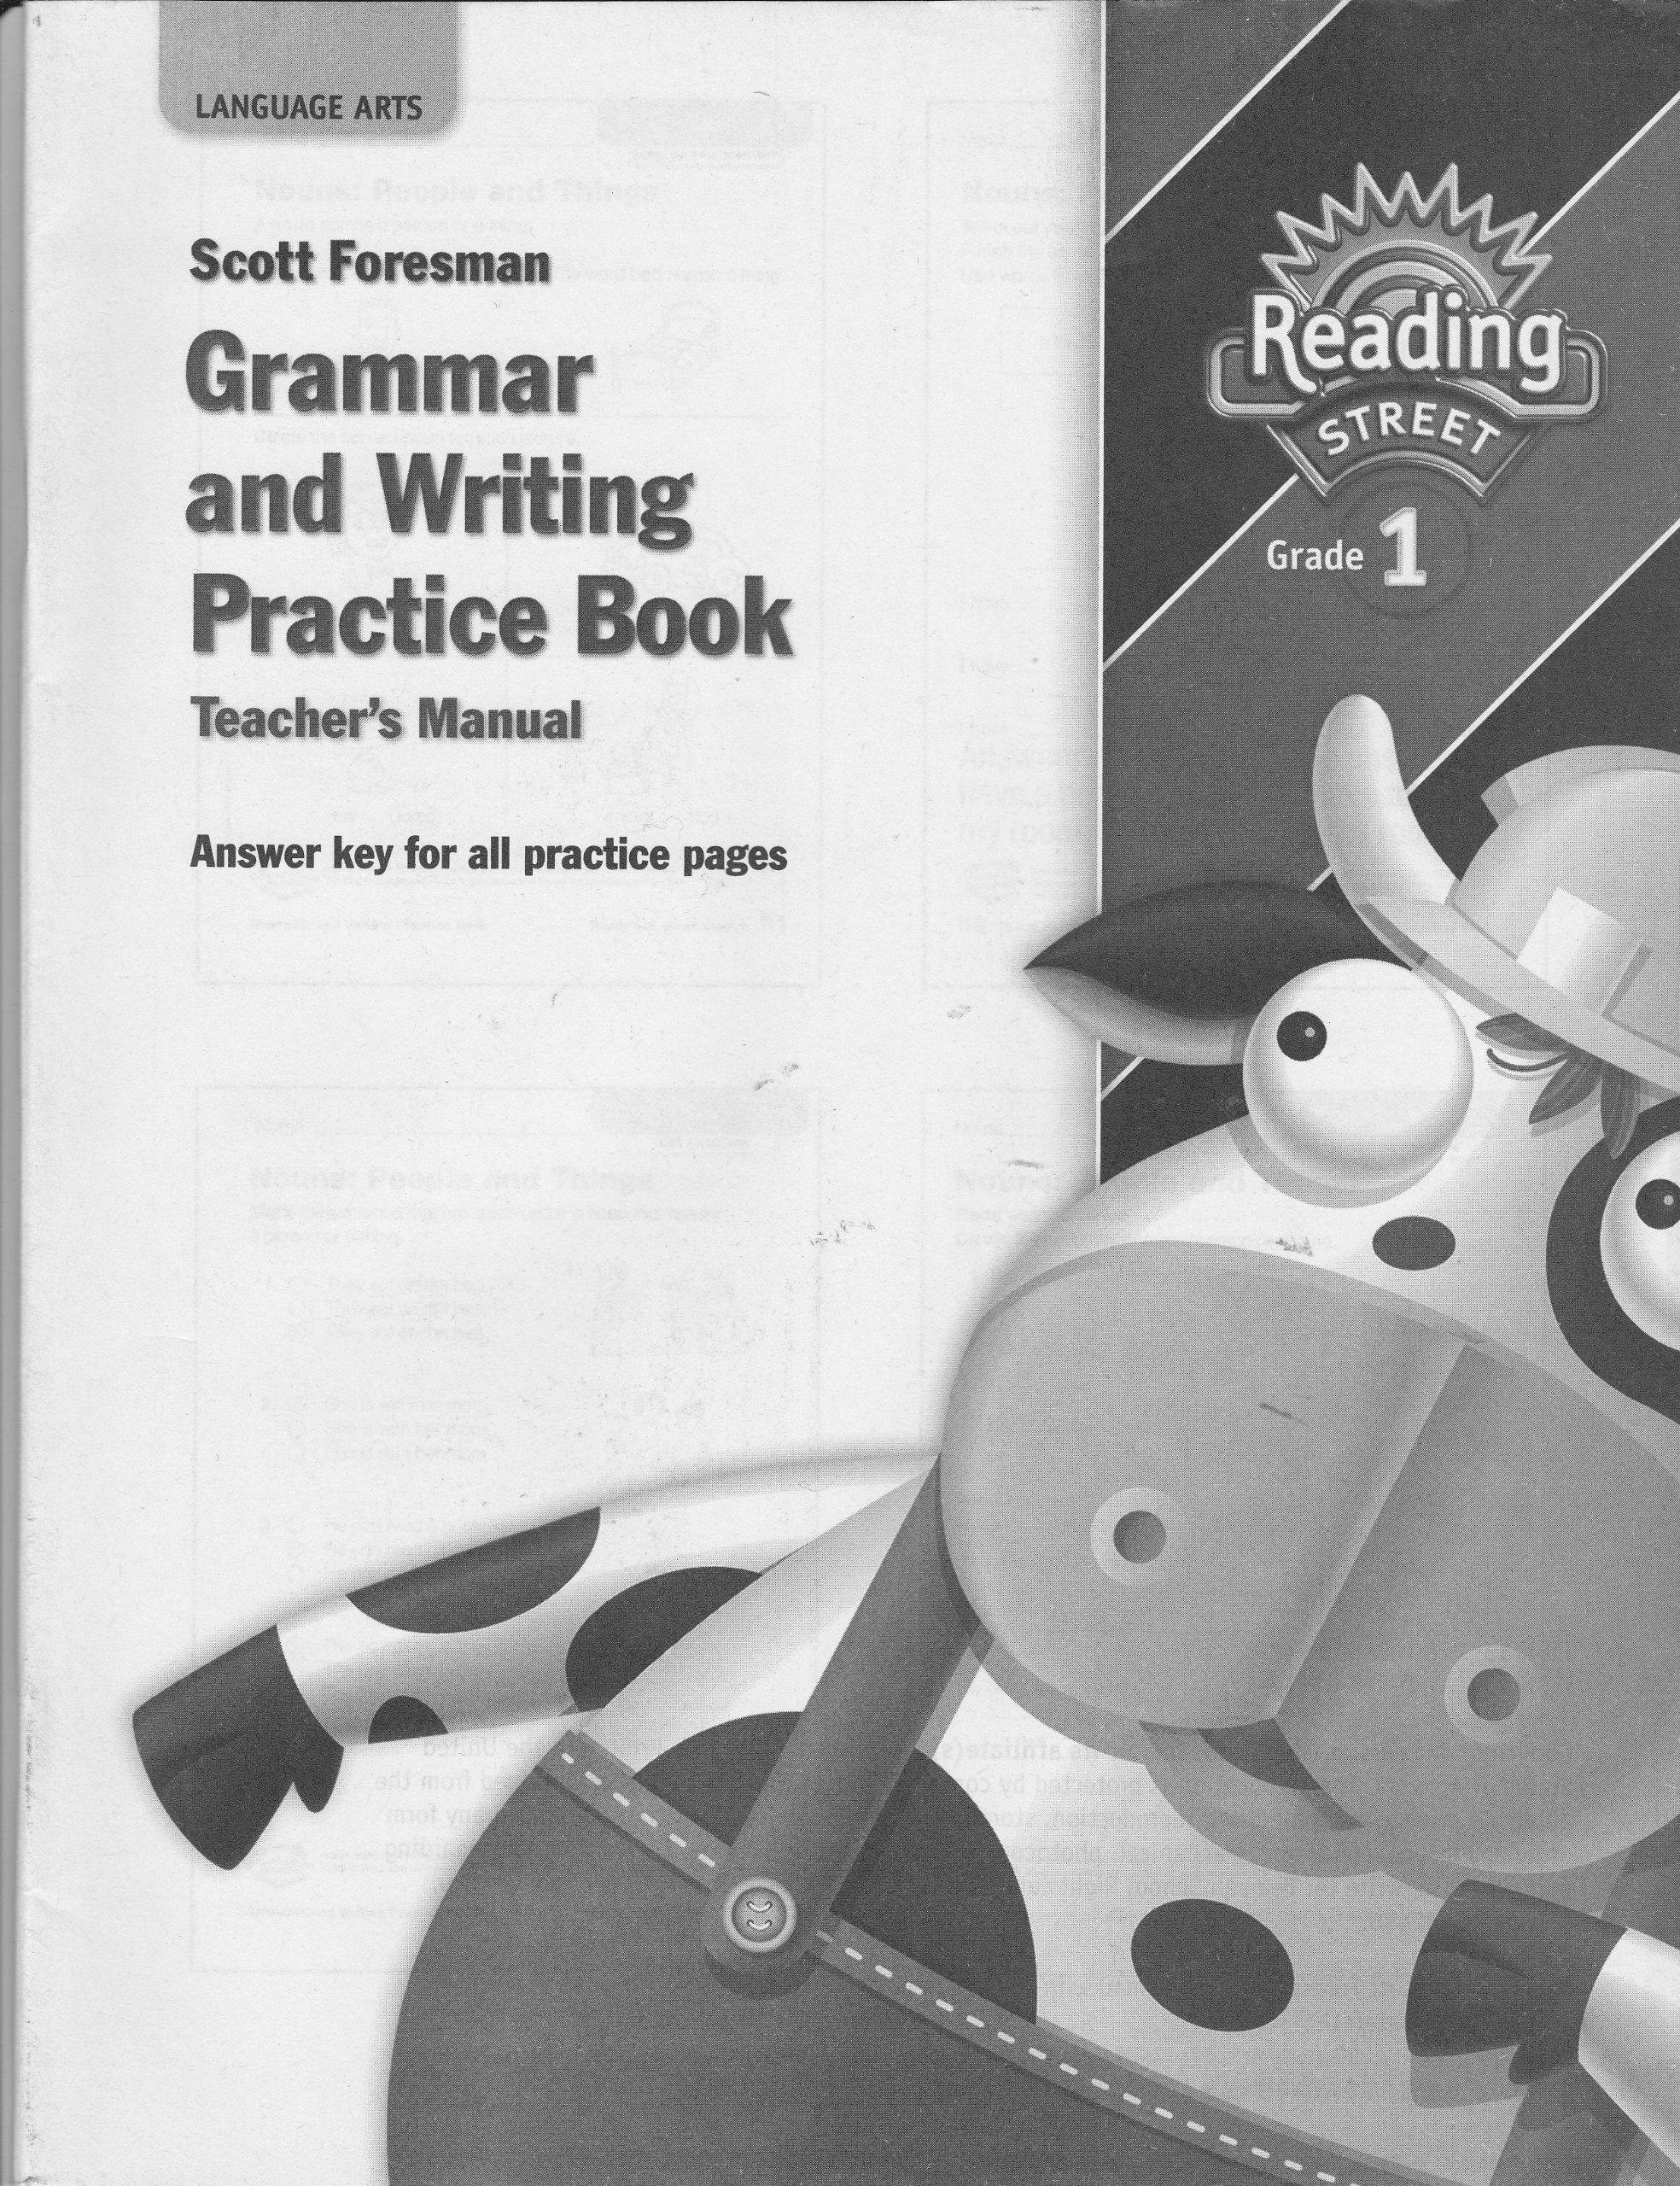 Scott Foresman Grammar and Writing Practice Book, Teacher's Manual (Pearson  California Reading Street, Grade 1): Pearson Scott Foresman: 9780328389476:  ...